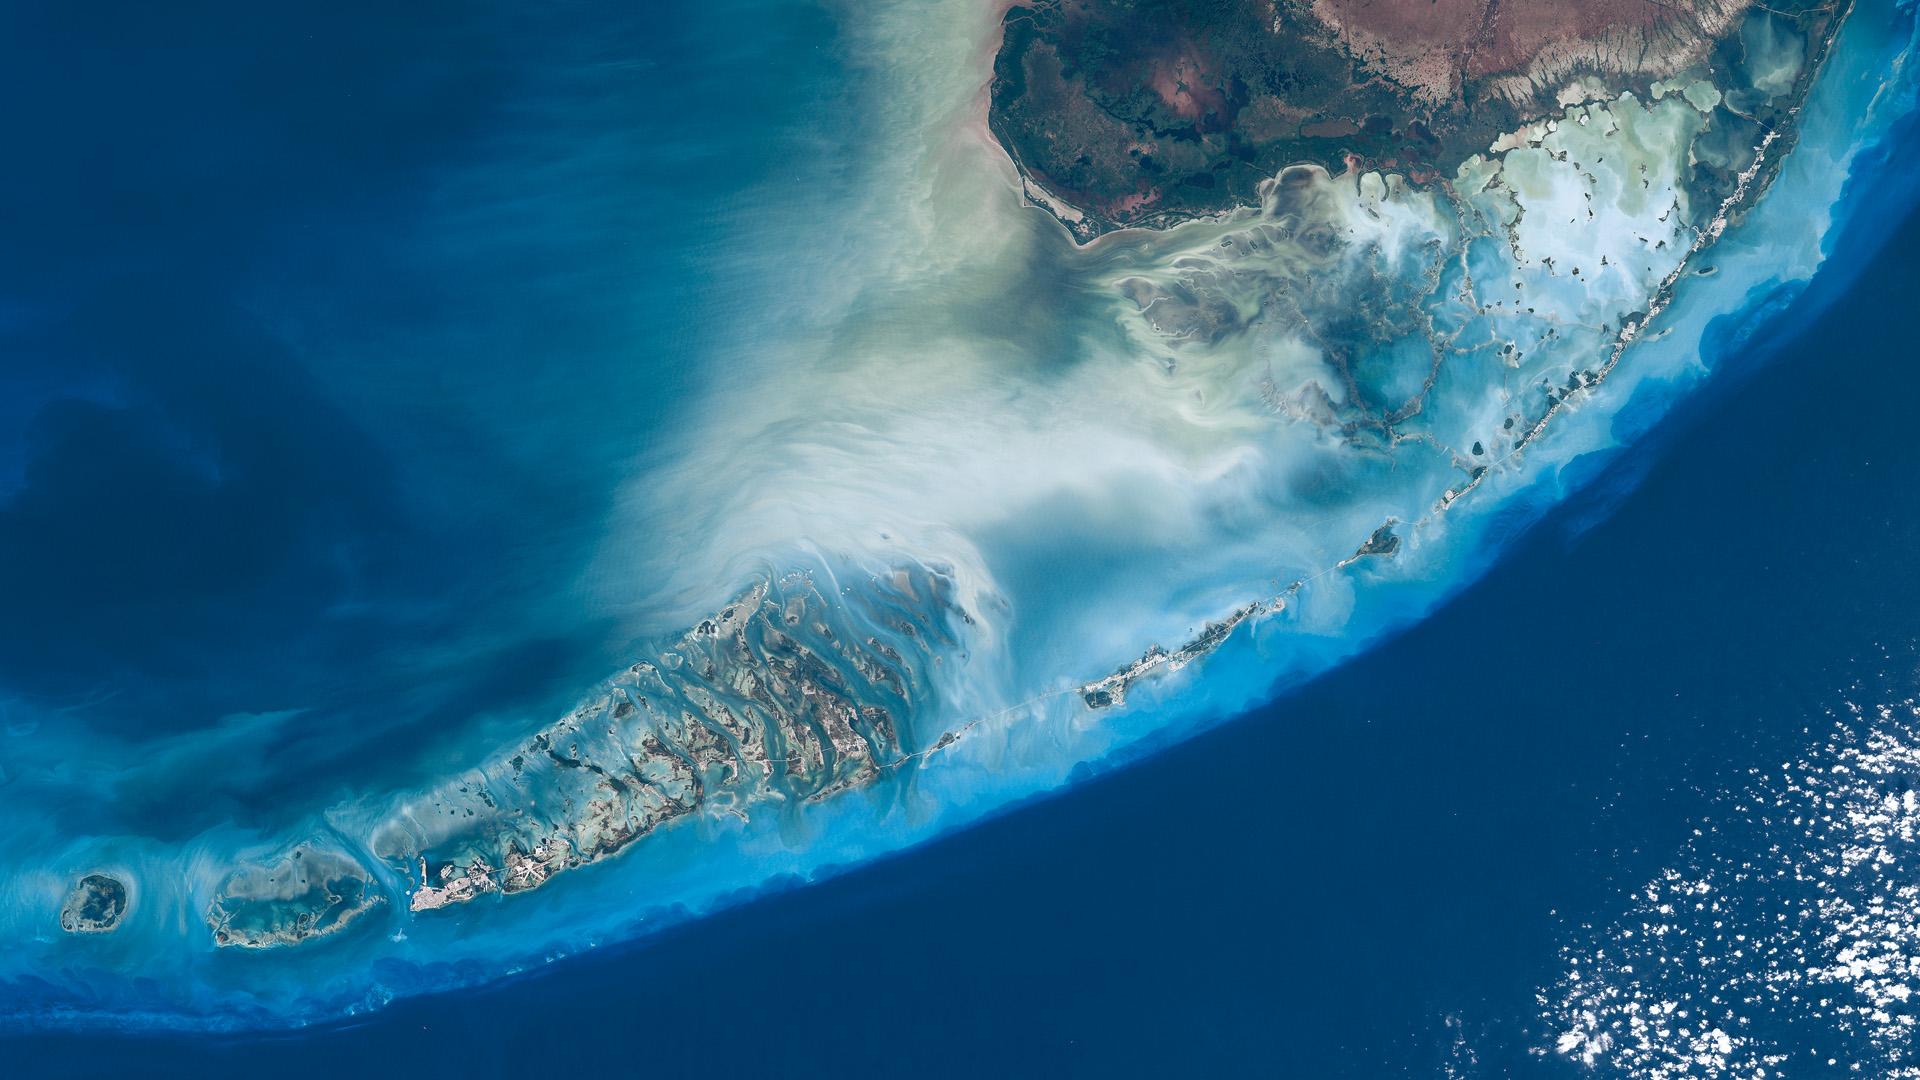 Florida coral reefs wallpapers high quality download free - Wallpaper florida keys ...